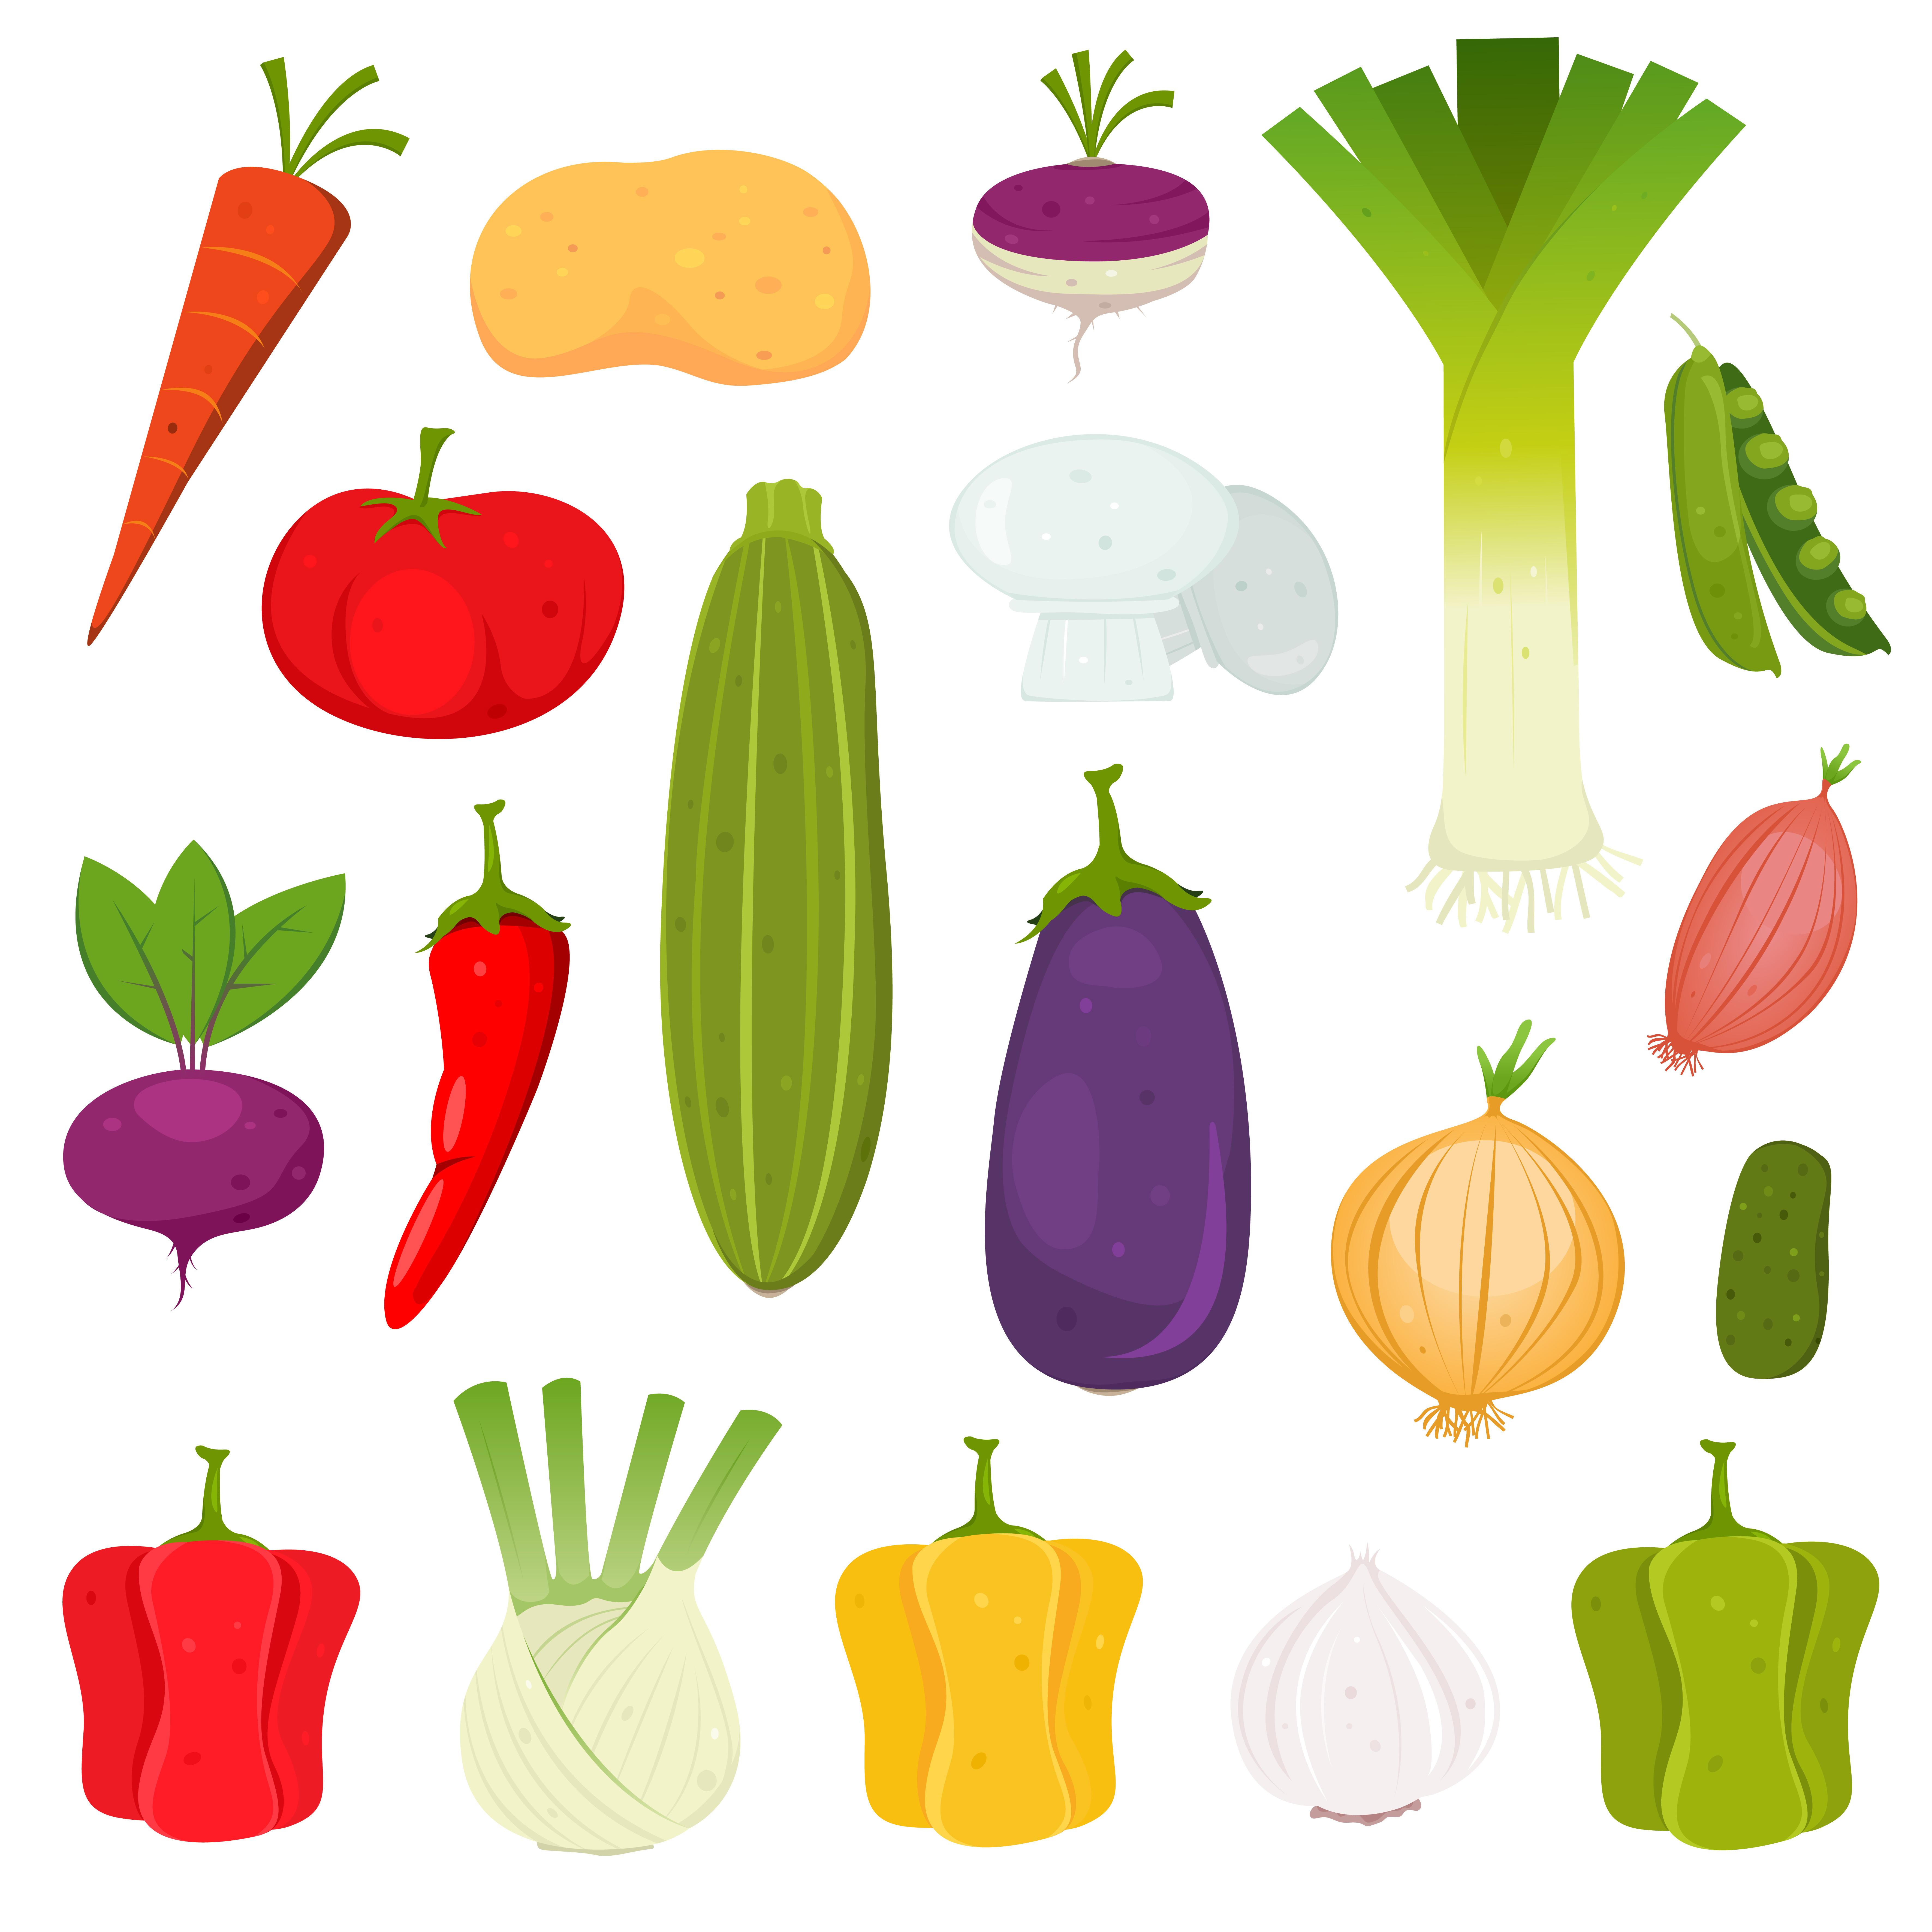 Vegetables Icons Set - Download Free Vectors, Clipart ...